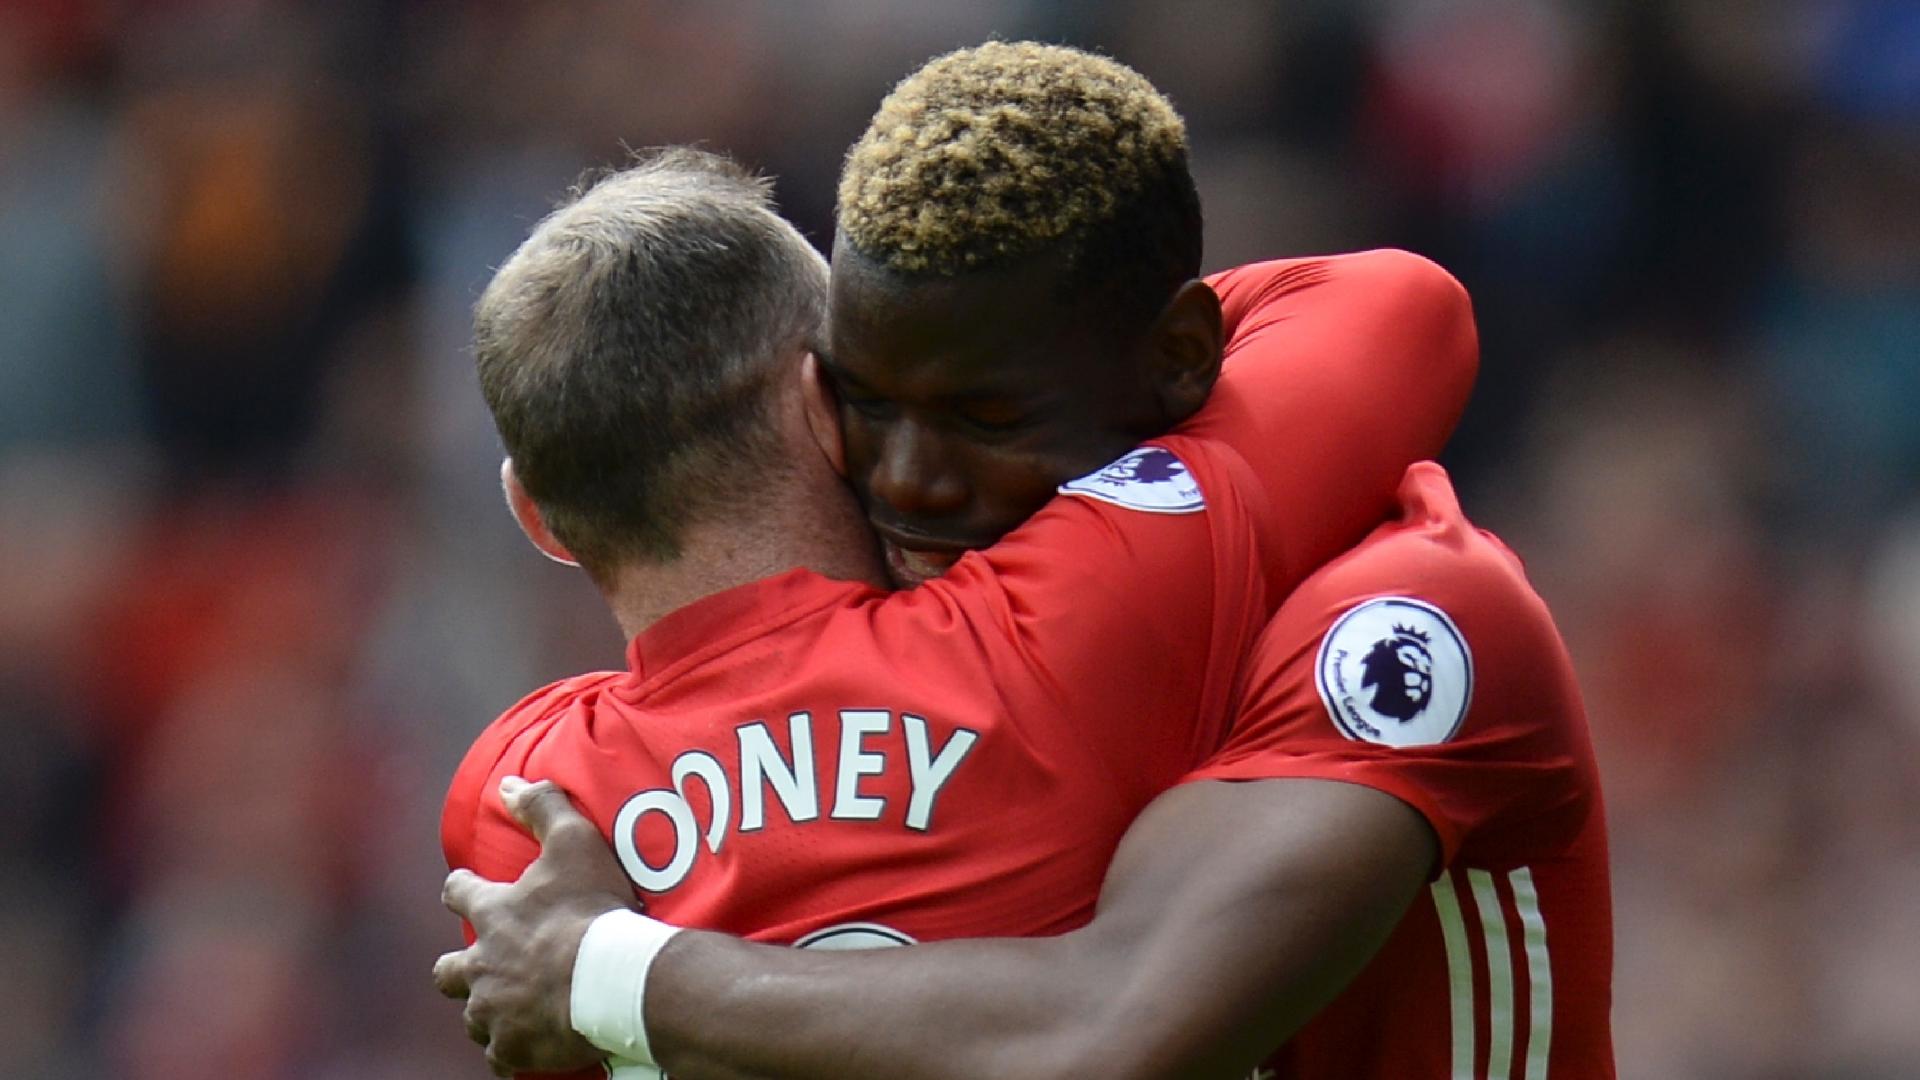 Rooney, Pogba, Man Utd